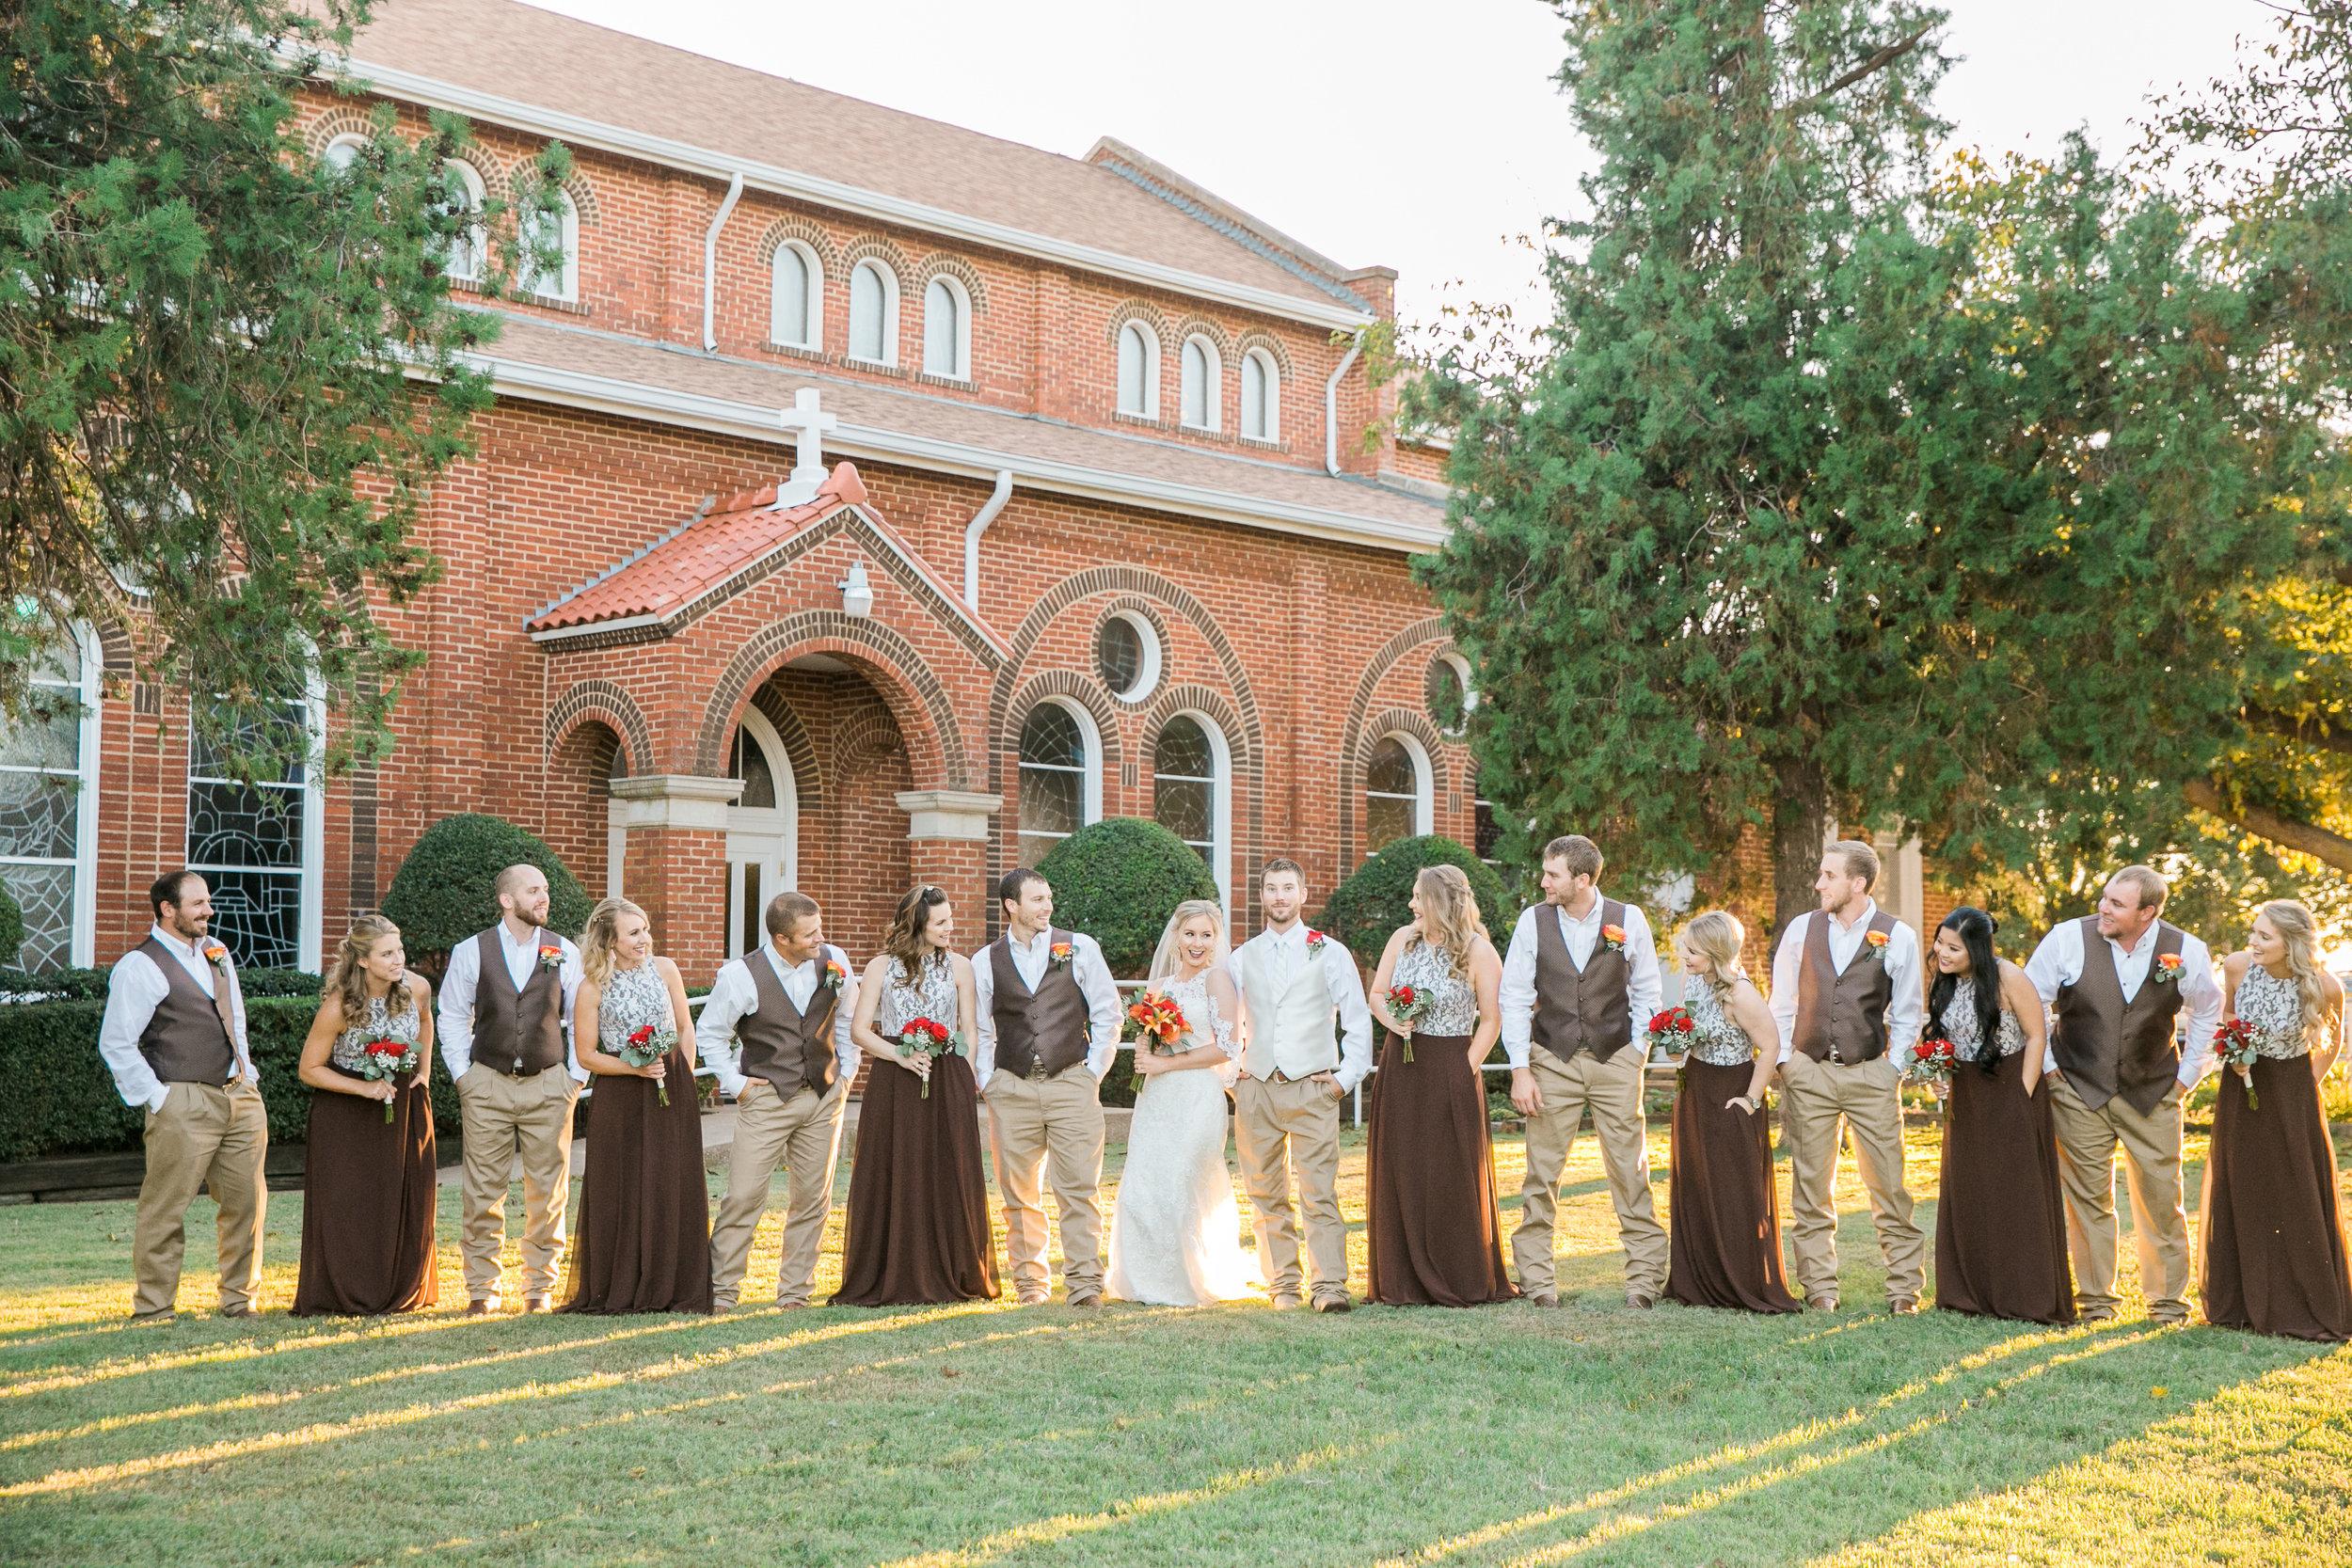 Bailey-Nathan-Windthorst-Texas-Wedding-047.jpg